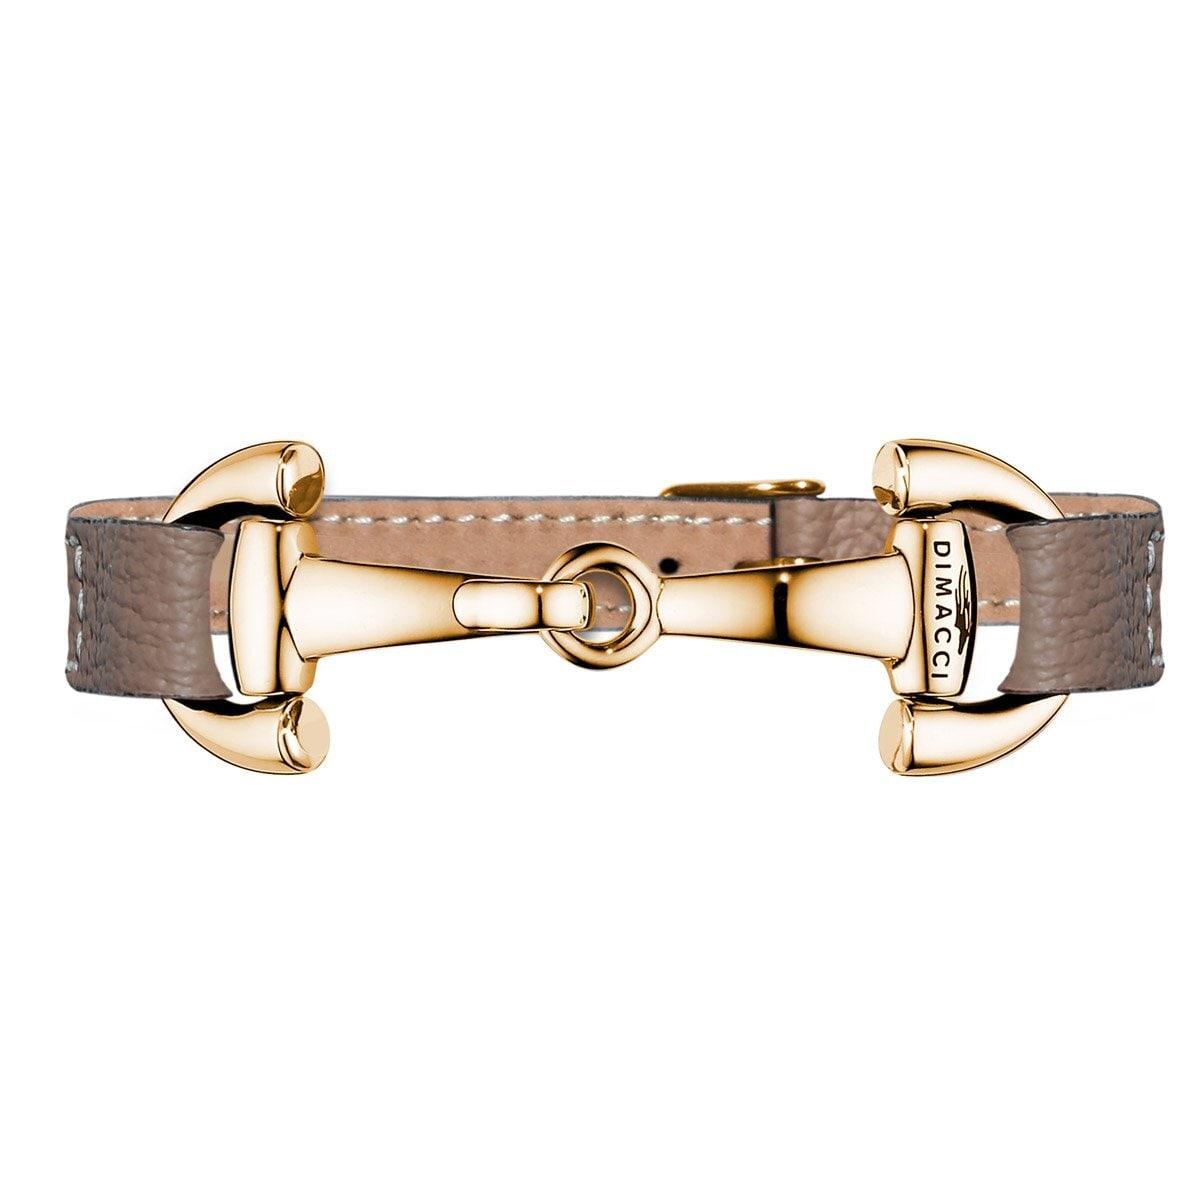 Bracelet ALBA Pure - Taupe/Gold